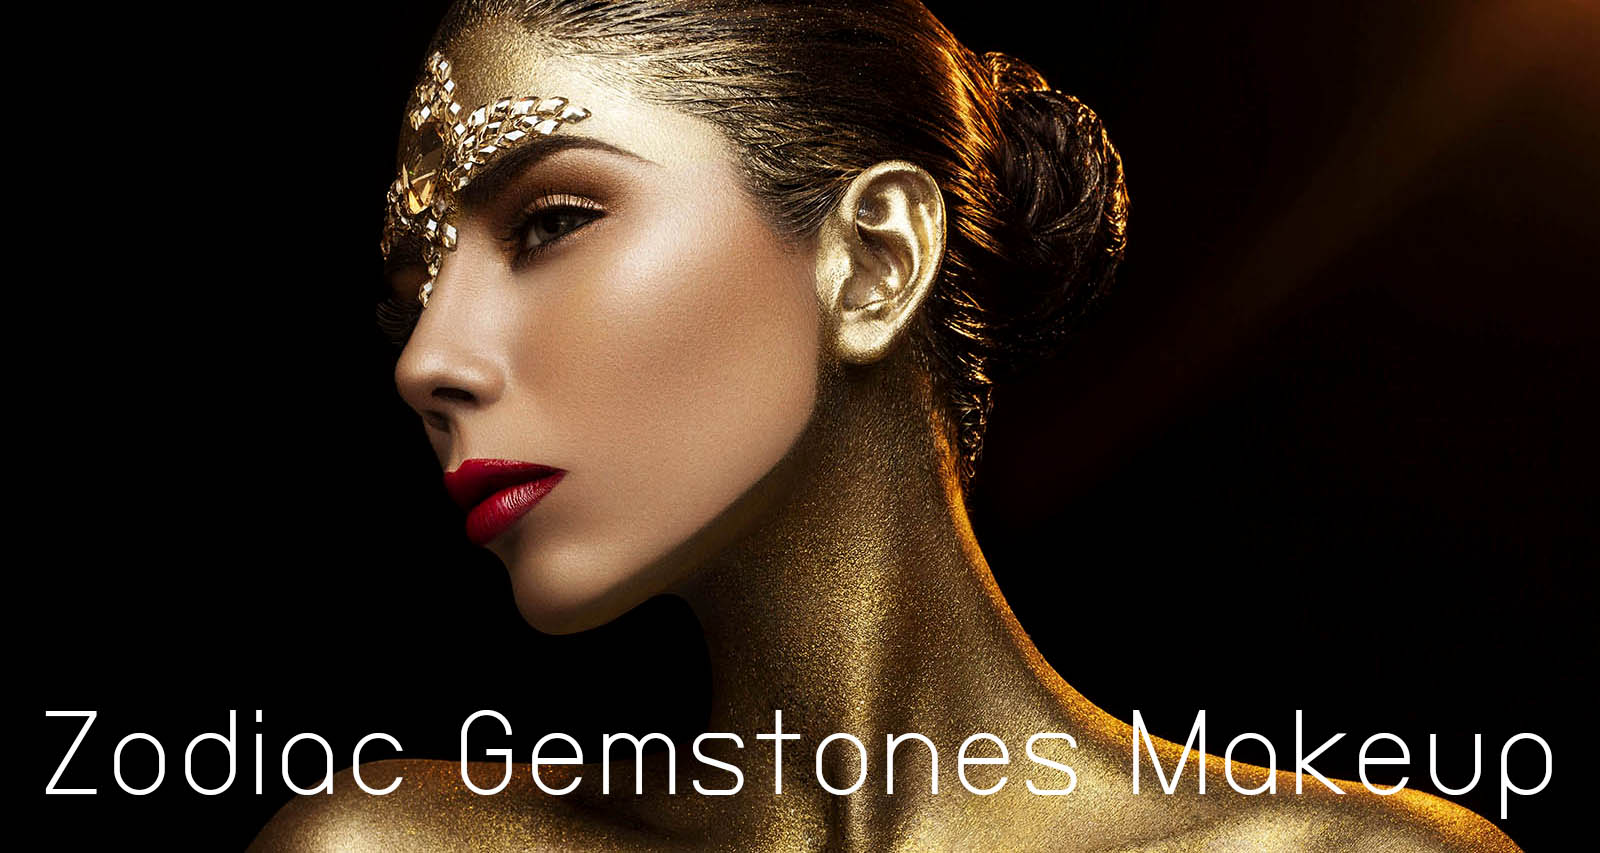 Zodiac Gemstones Makeup HEAD